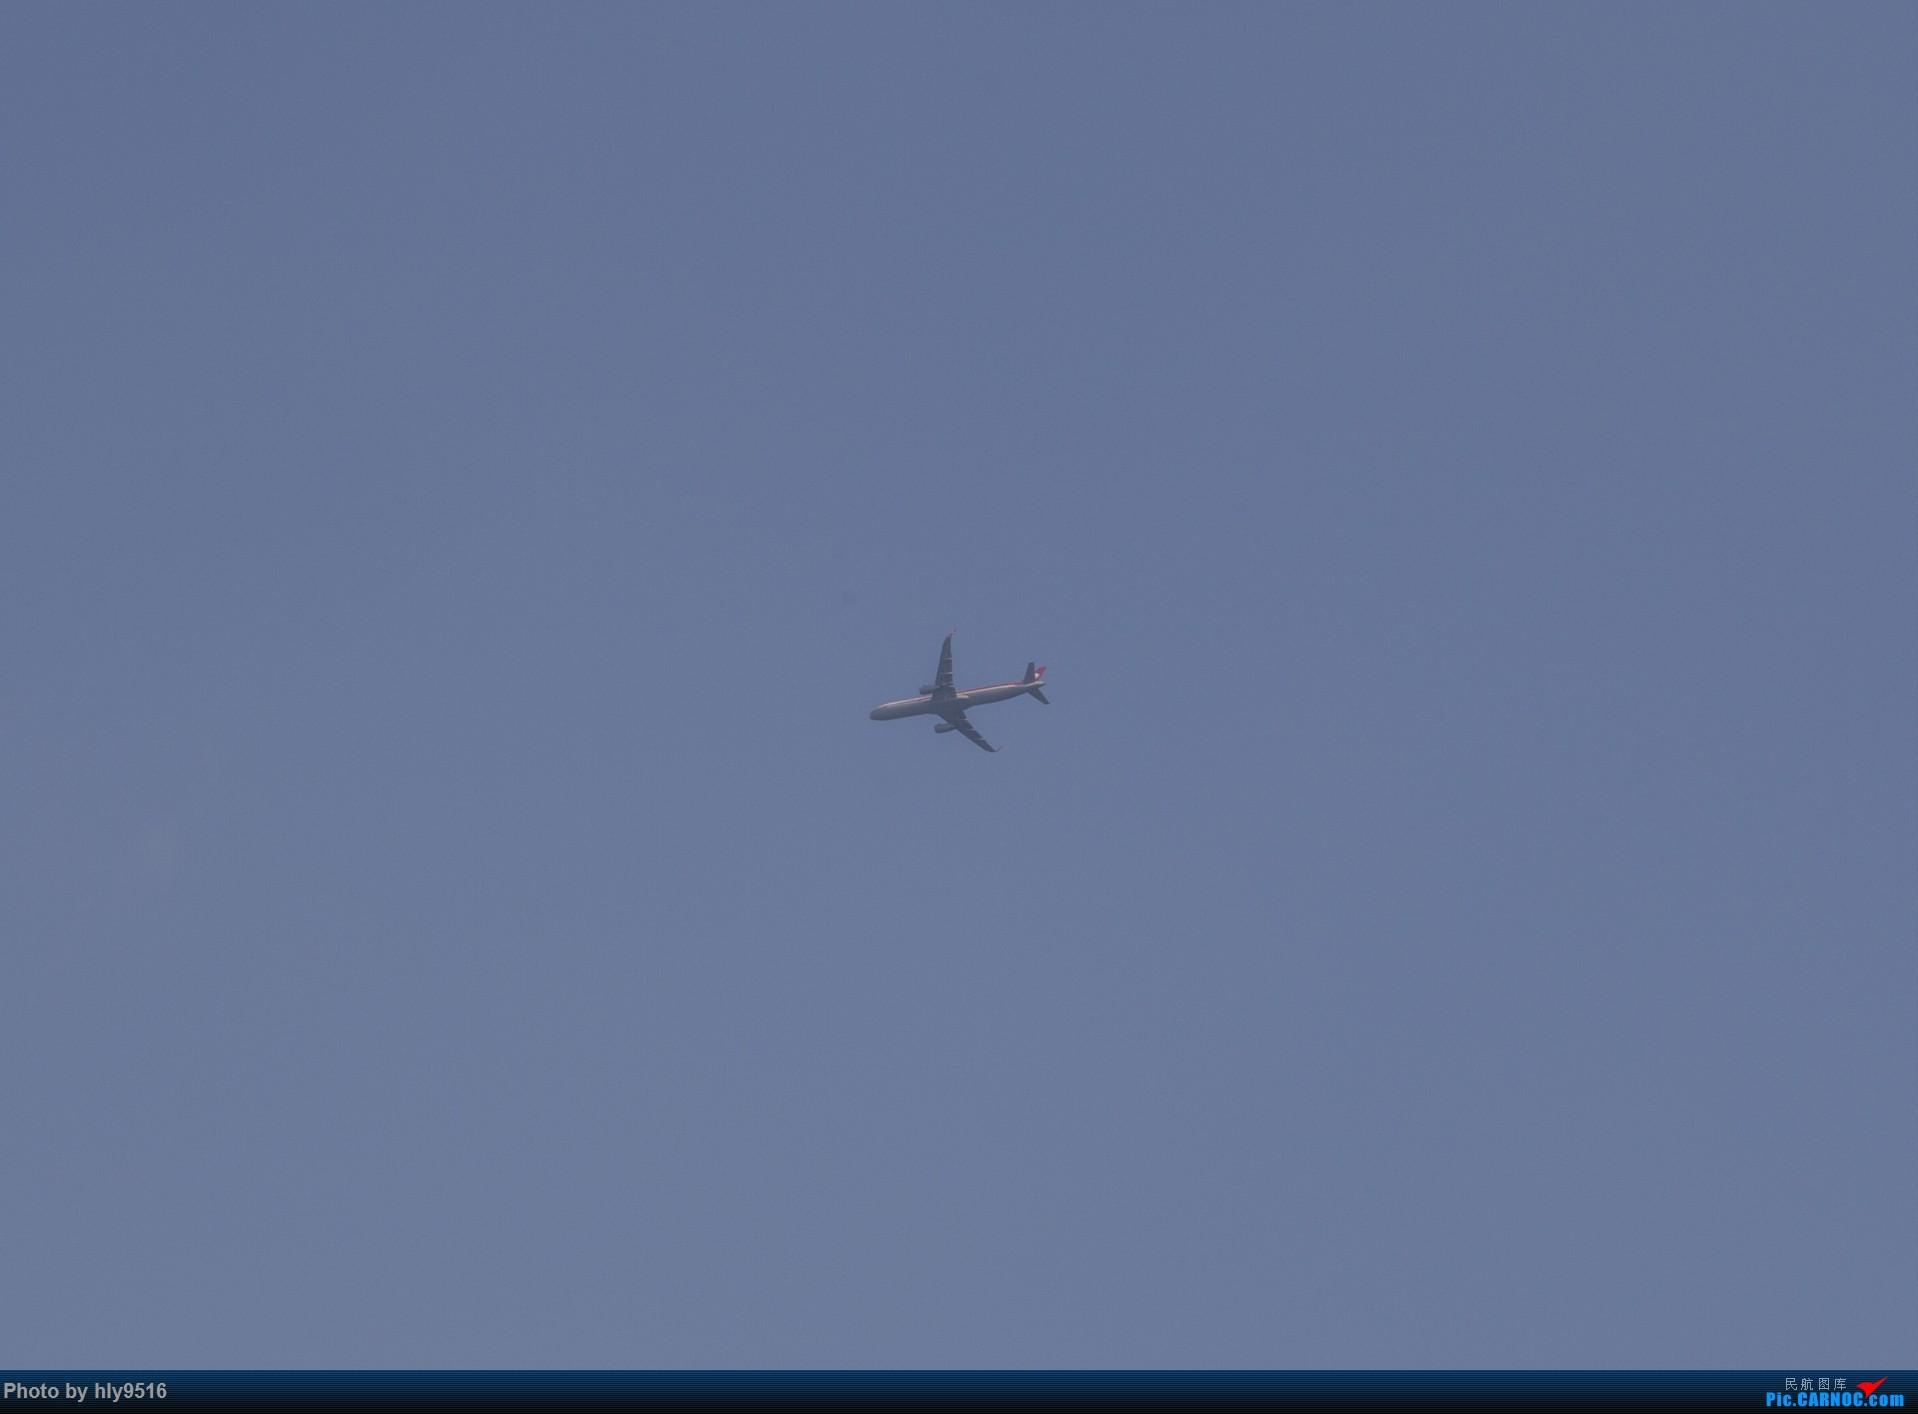 Re:[原创]【CTU】终于解决了大怨念南航A380 偶遇长荣新涂装 两次复飞 小怨念若干